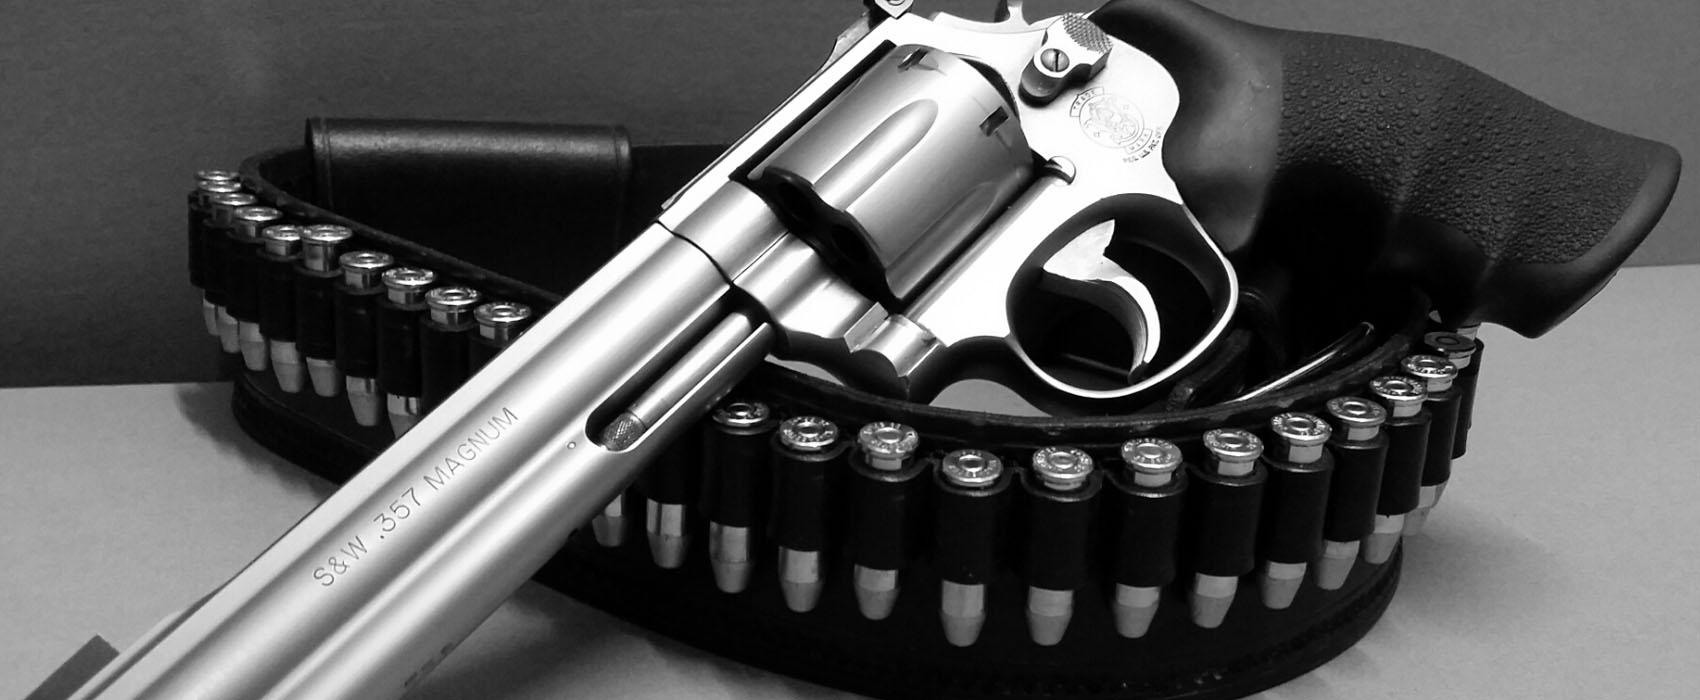 Revolver im Kaliber .357 Mag.